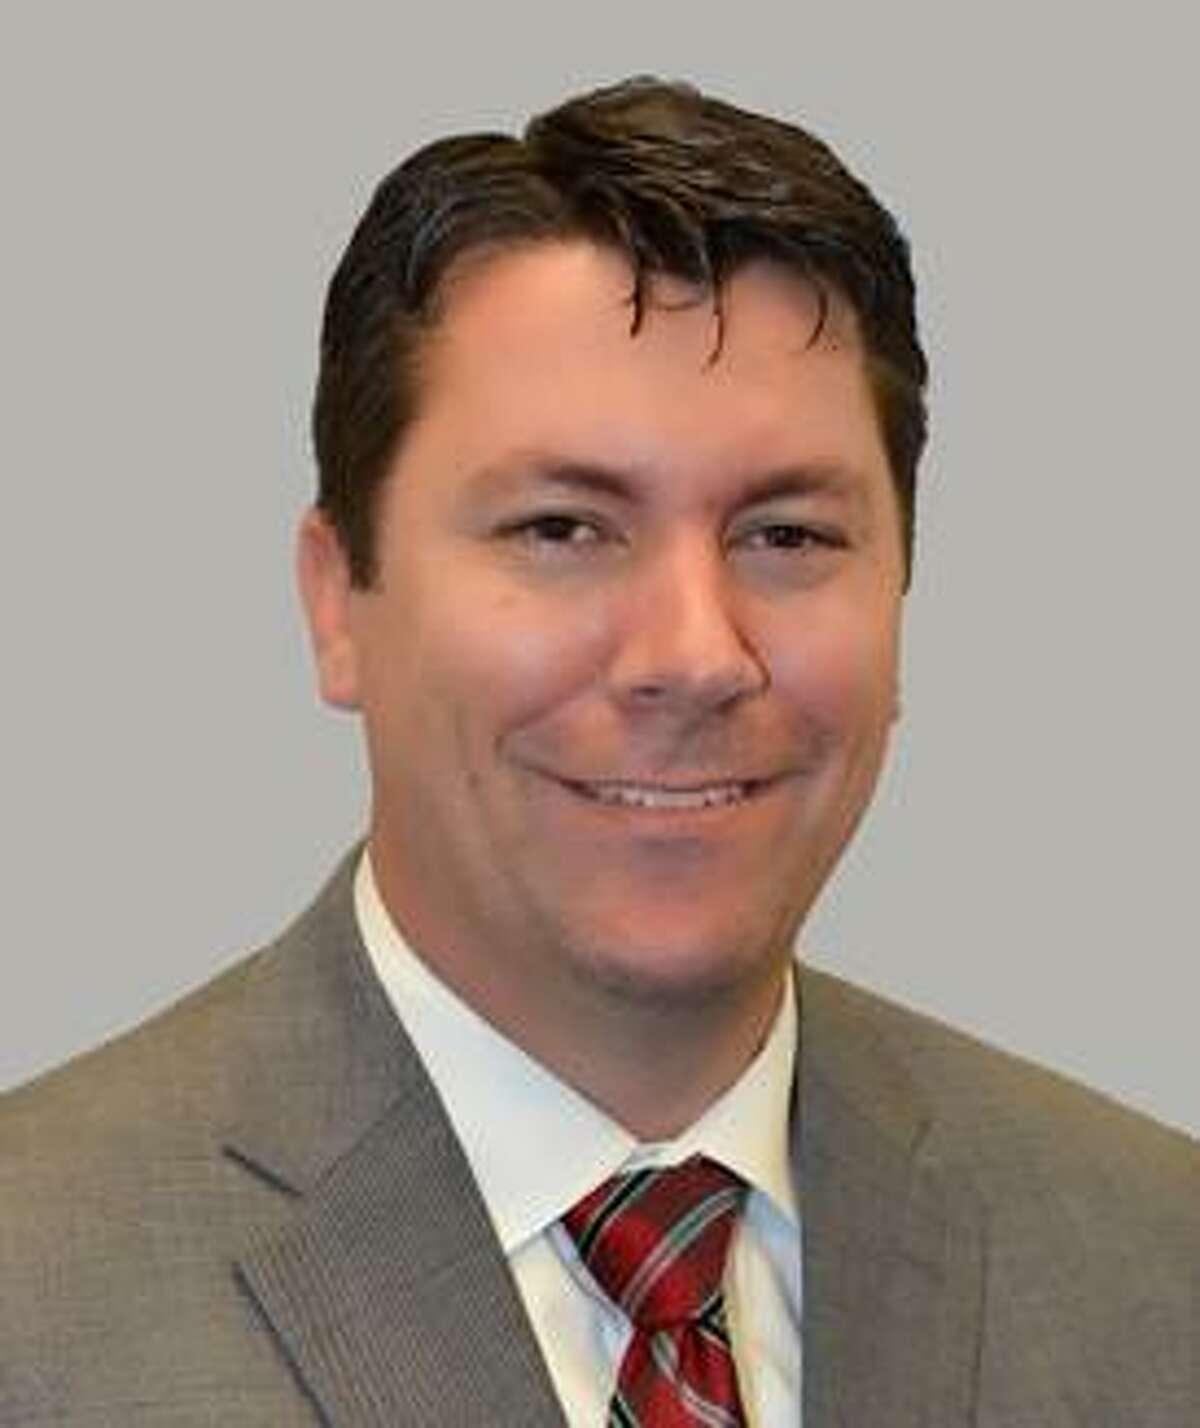 Trey Clark is a vice president at Halliburton.